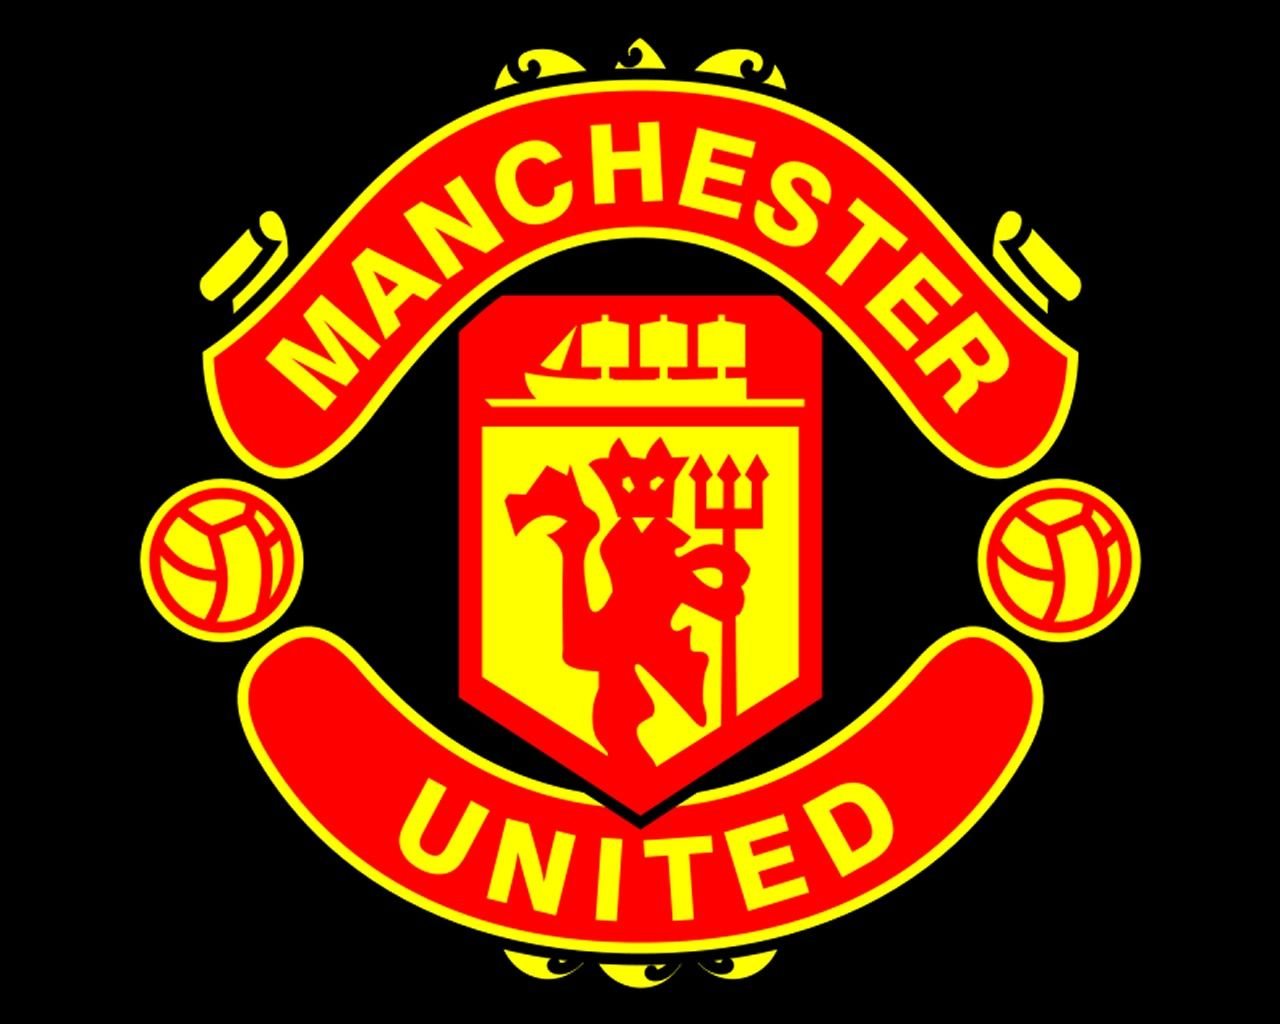 Manchester United Logo Manchester United Logo Manchester United Football Club Manchester United Football